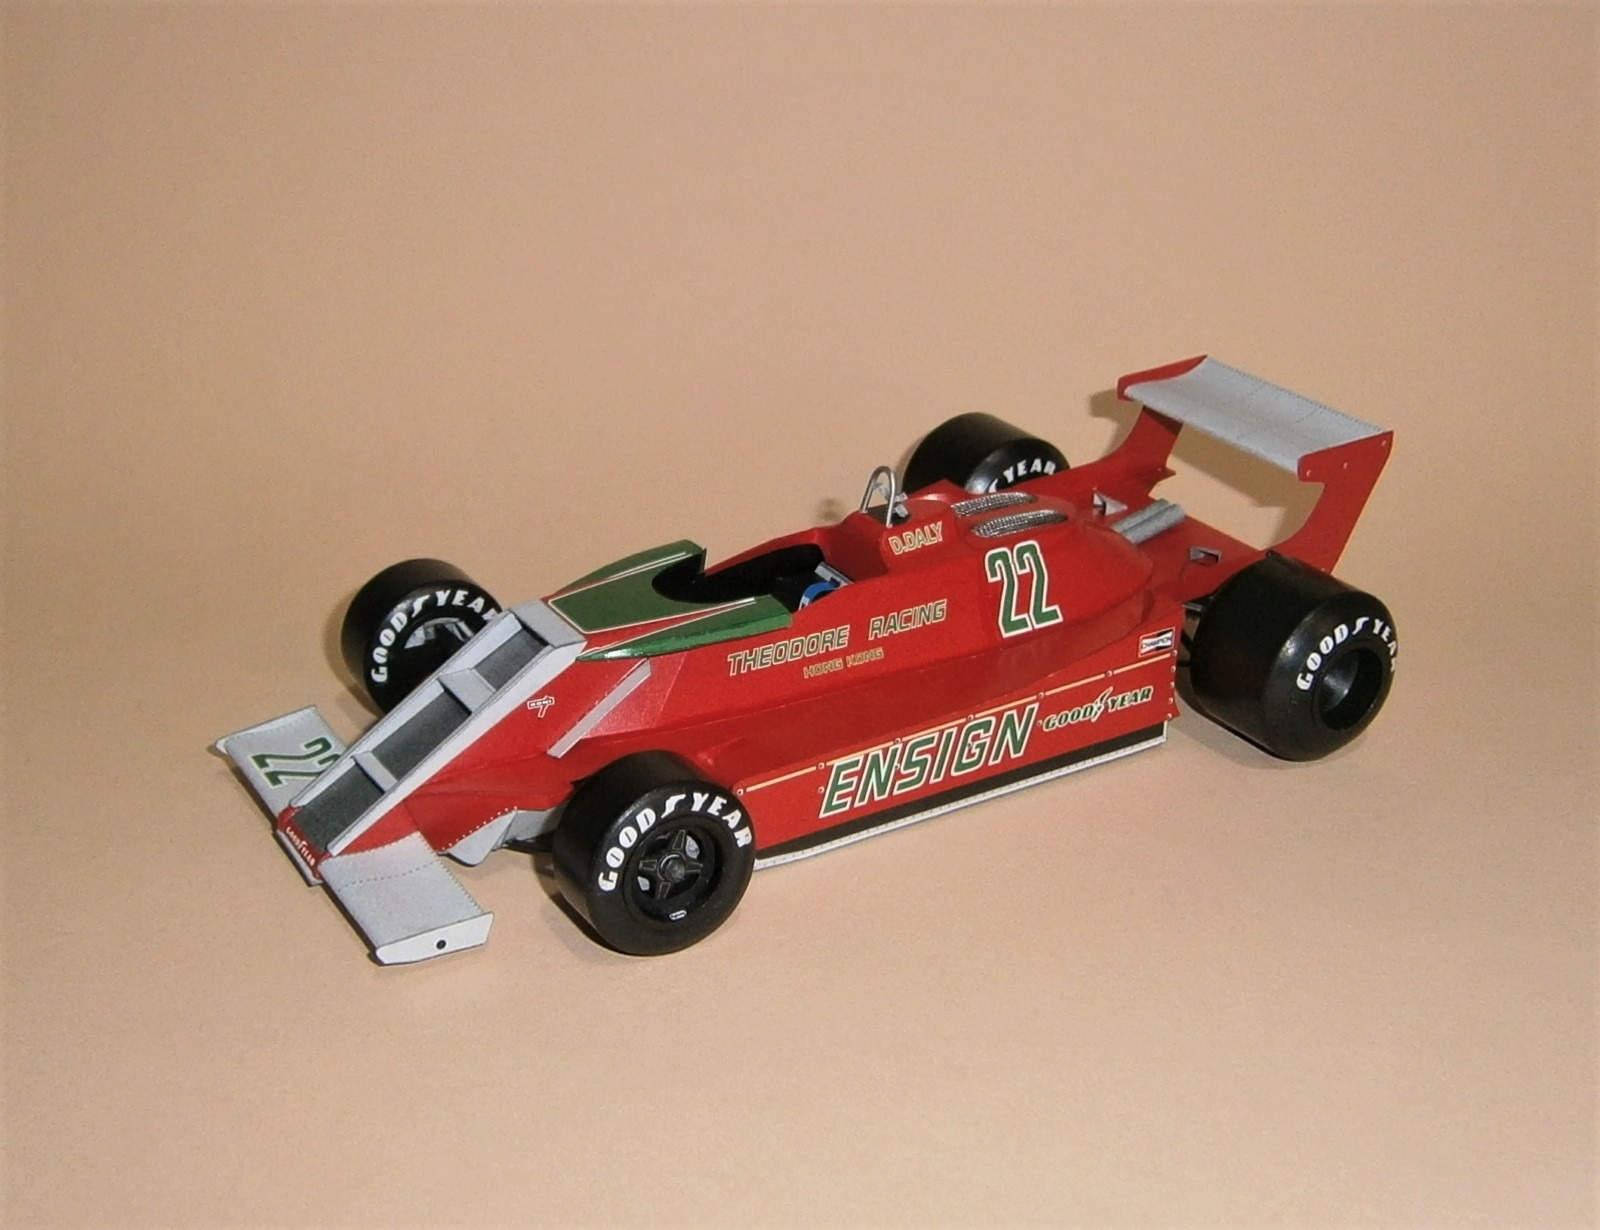 Ensign N179 - D.Daly, GP JAR-qualify 1979